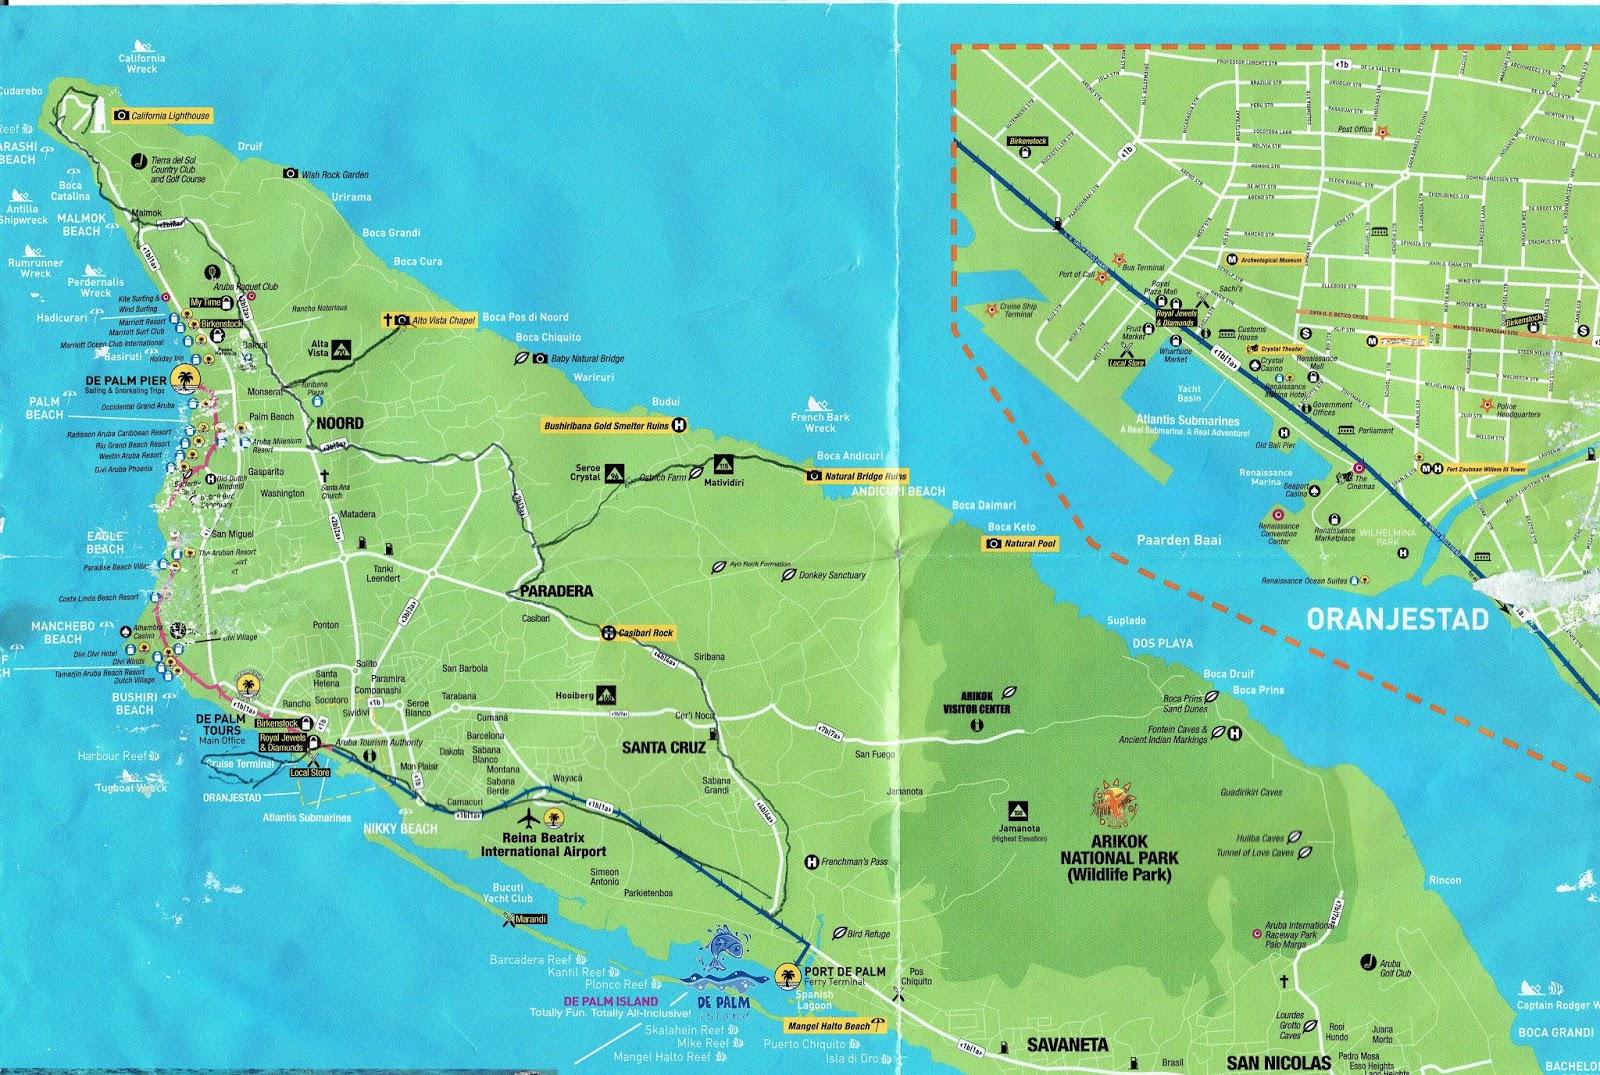 Aruba Tourist Map Related Keywords & Suggestions - Aruba Tourist Map on